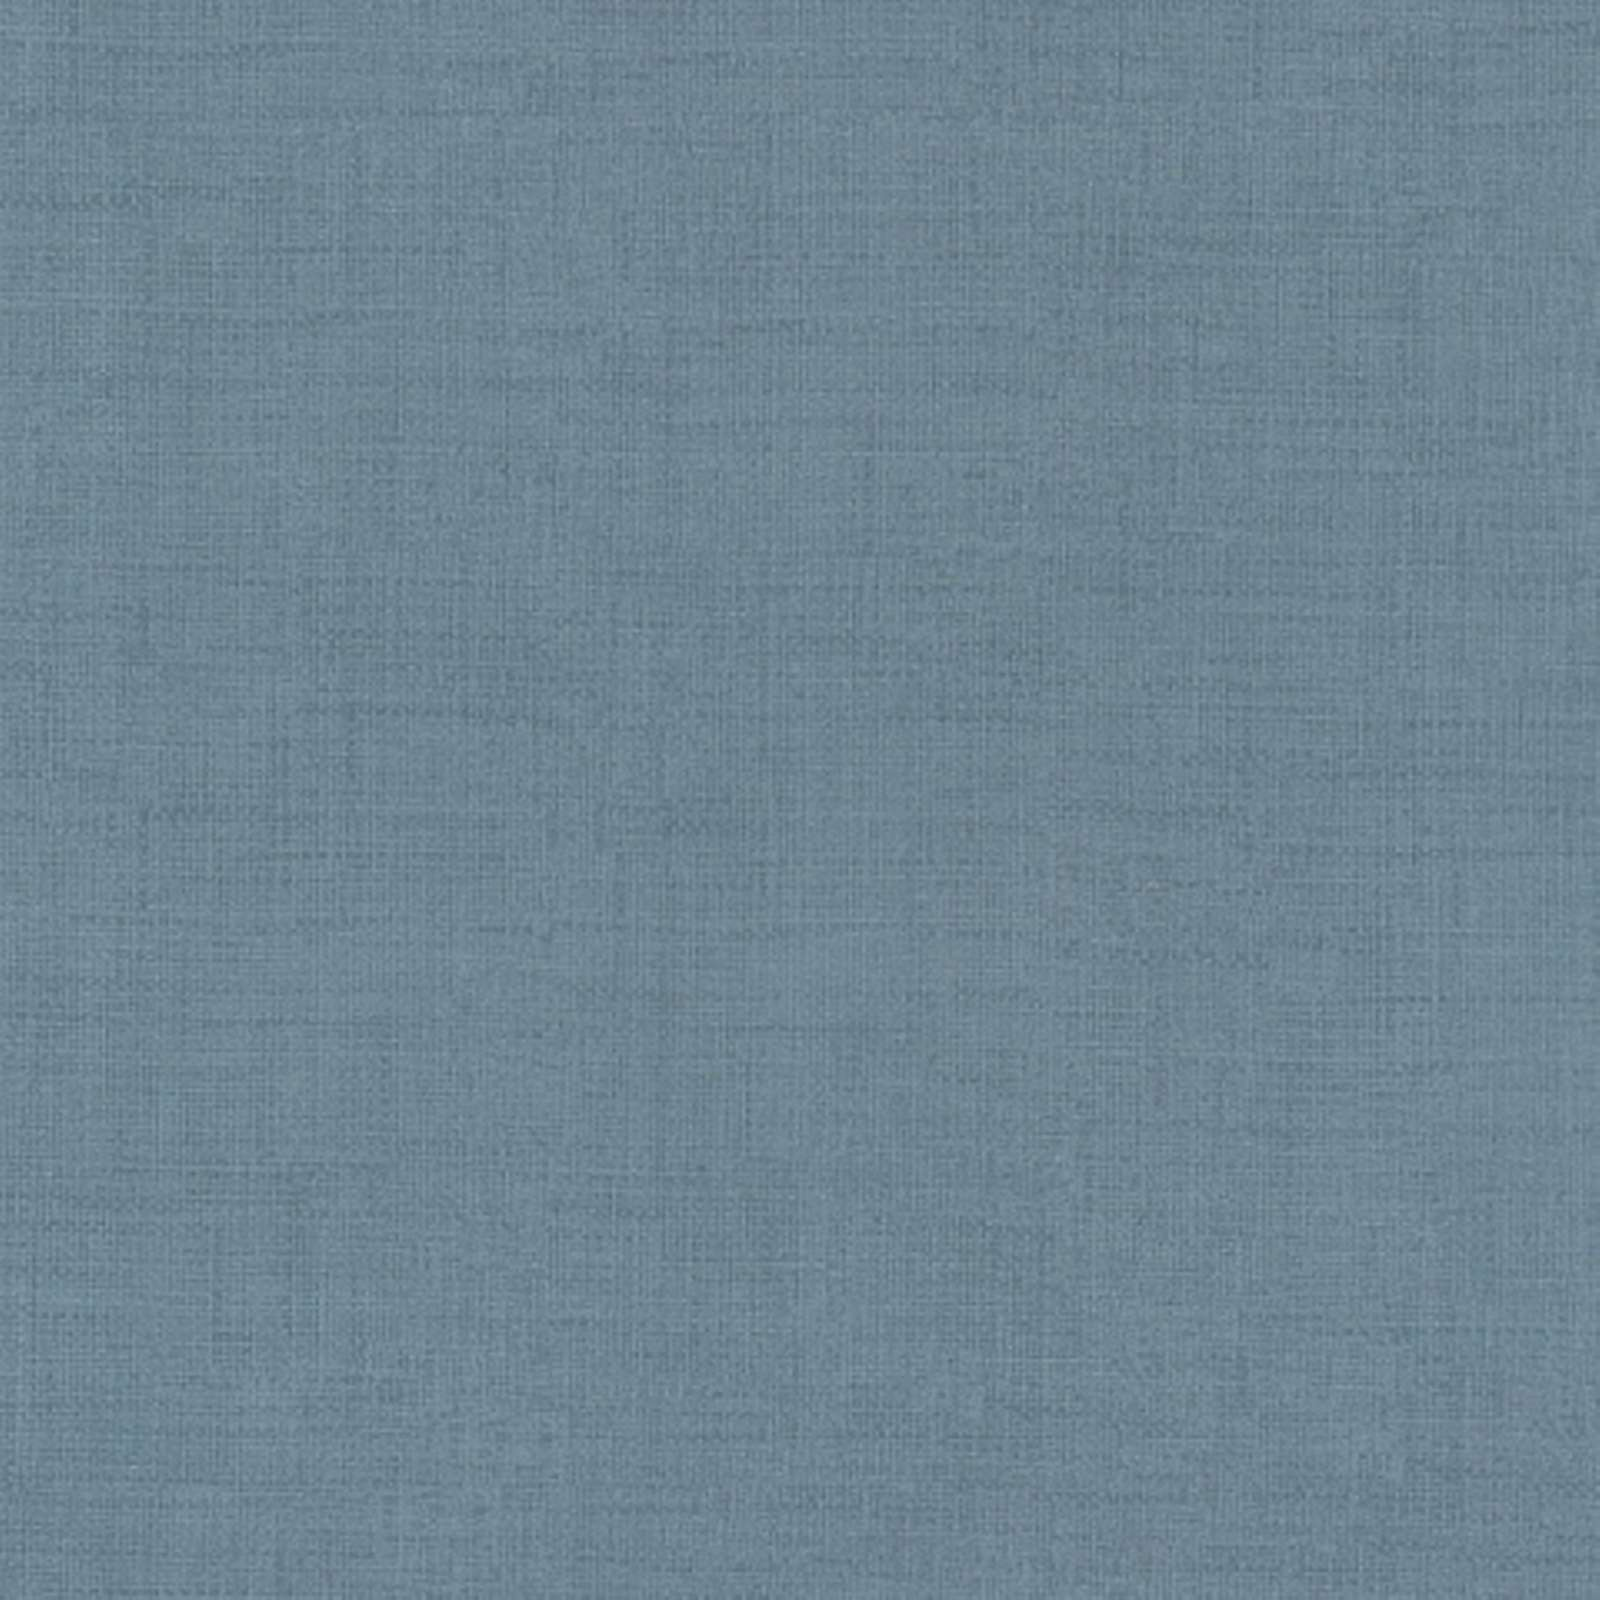 Керамогранит Планте лазурный тёмный SG929100N, 300х300х8 мм, Kerama Marazzi